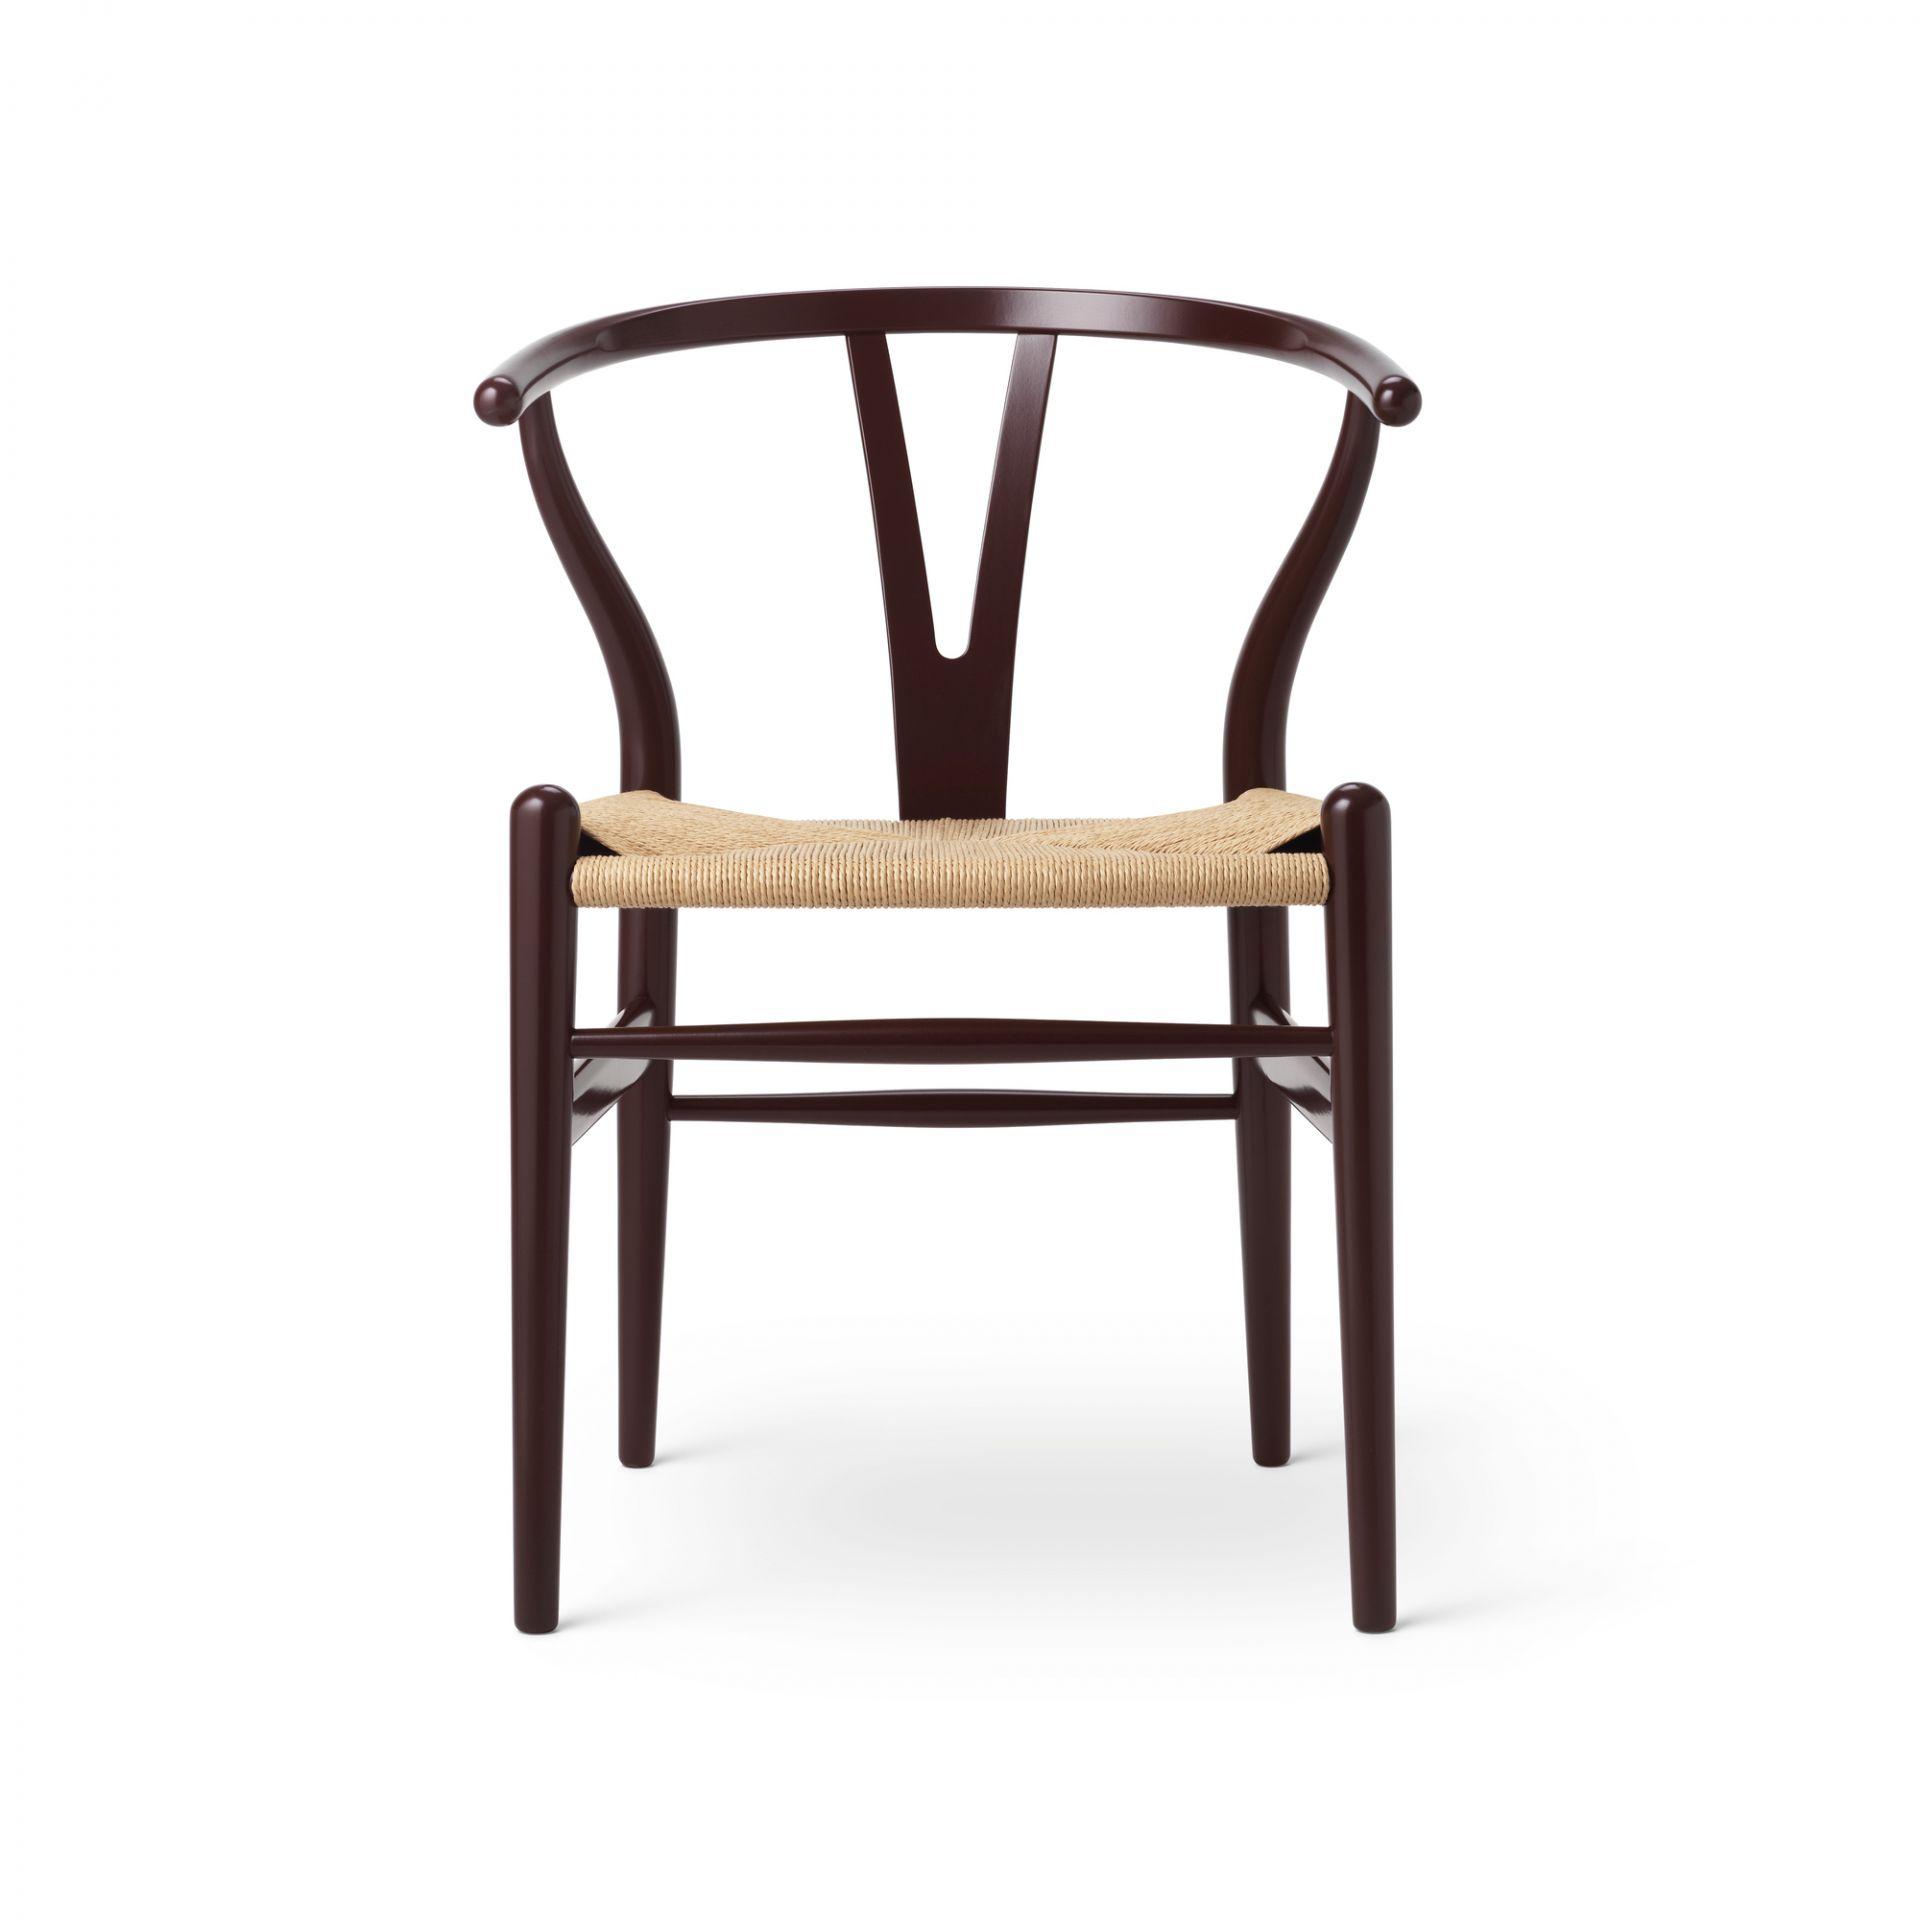 CH24 Wishbone Chair Russet & Blues oder Harmony Stuhl Carl Hansen & Søn - LIMITED EDITION